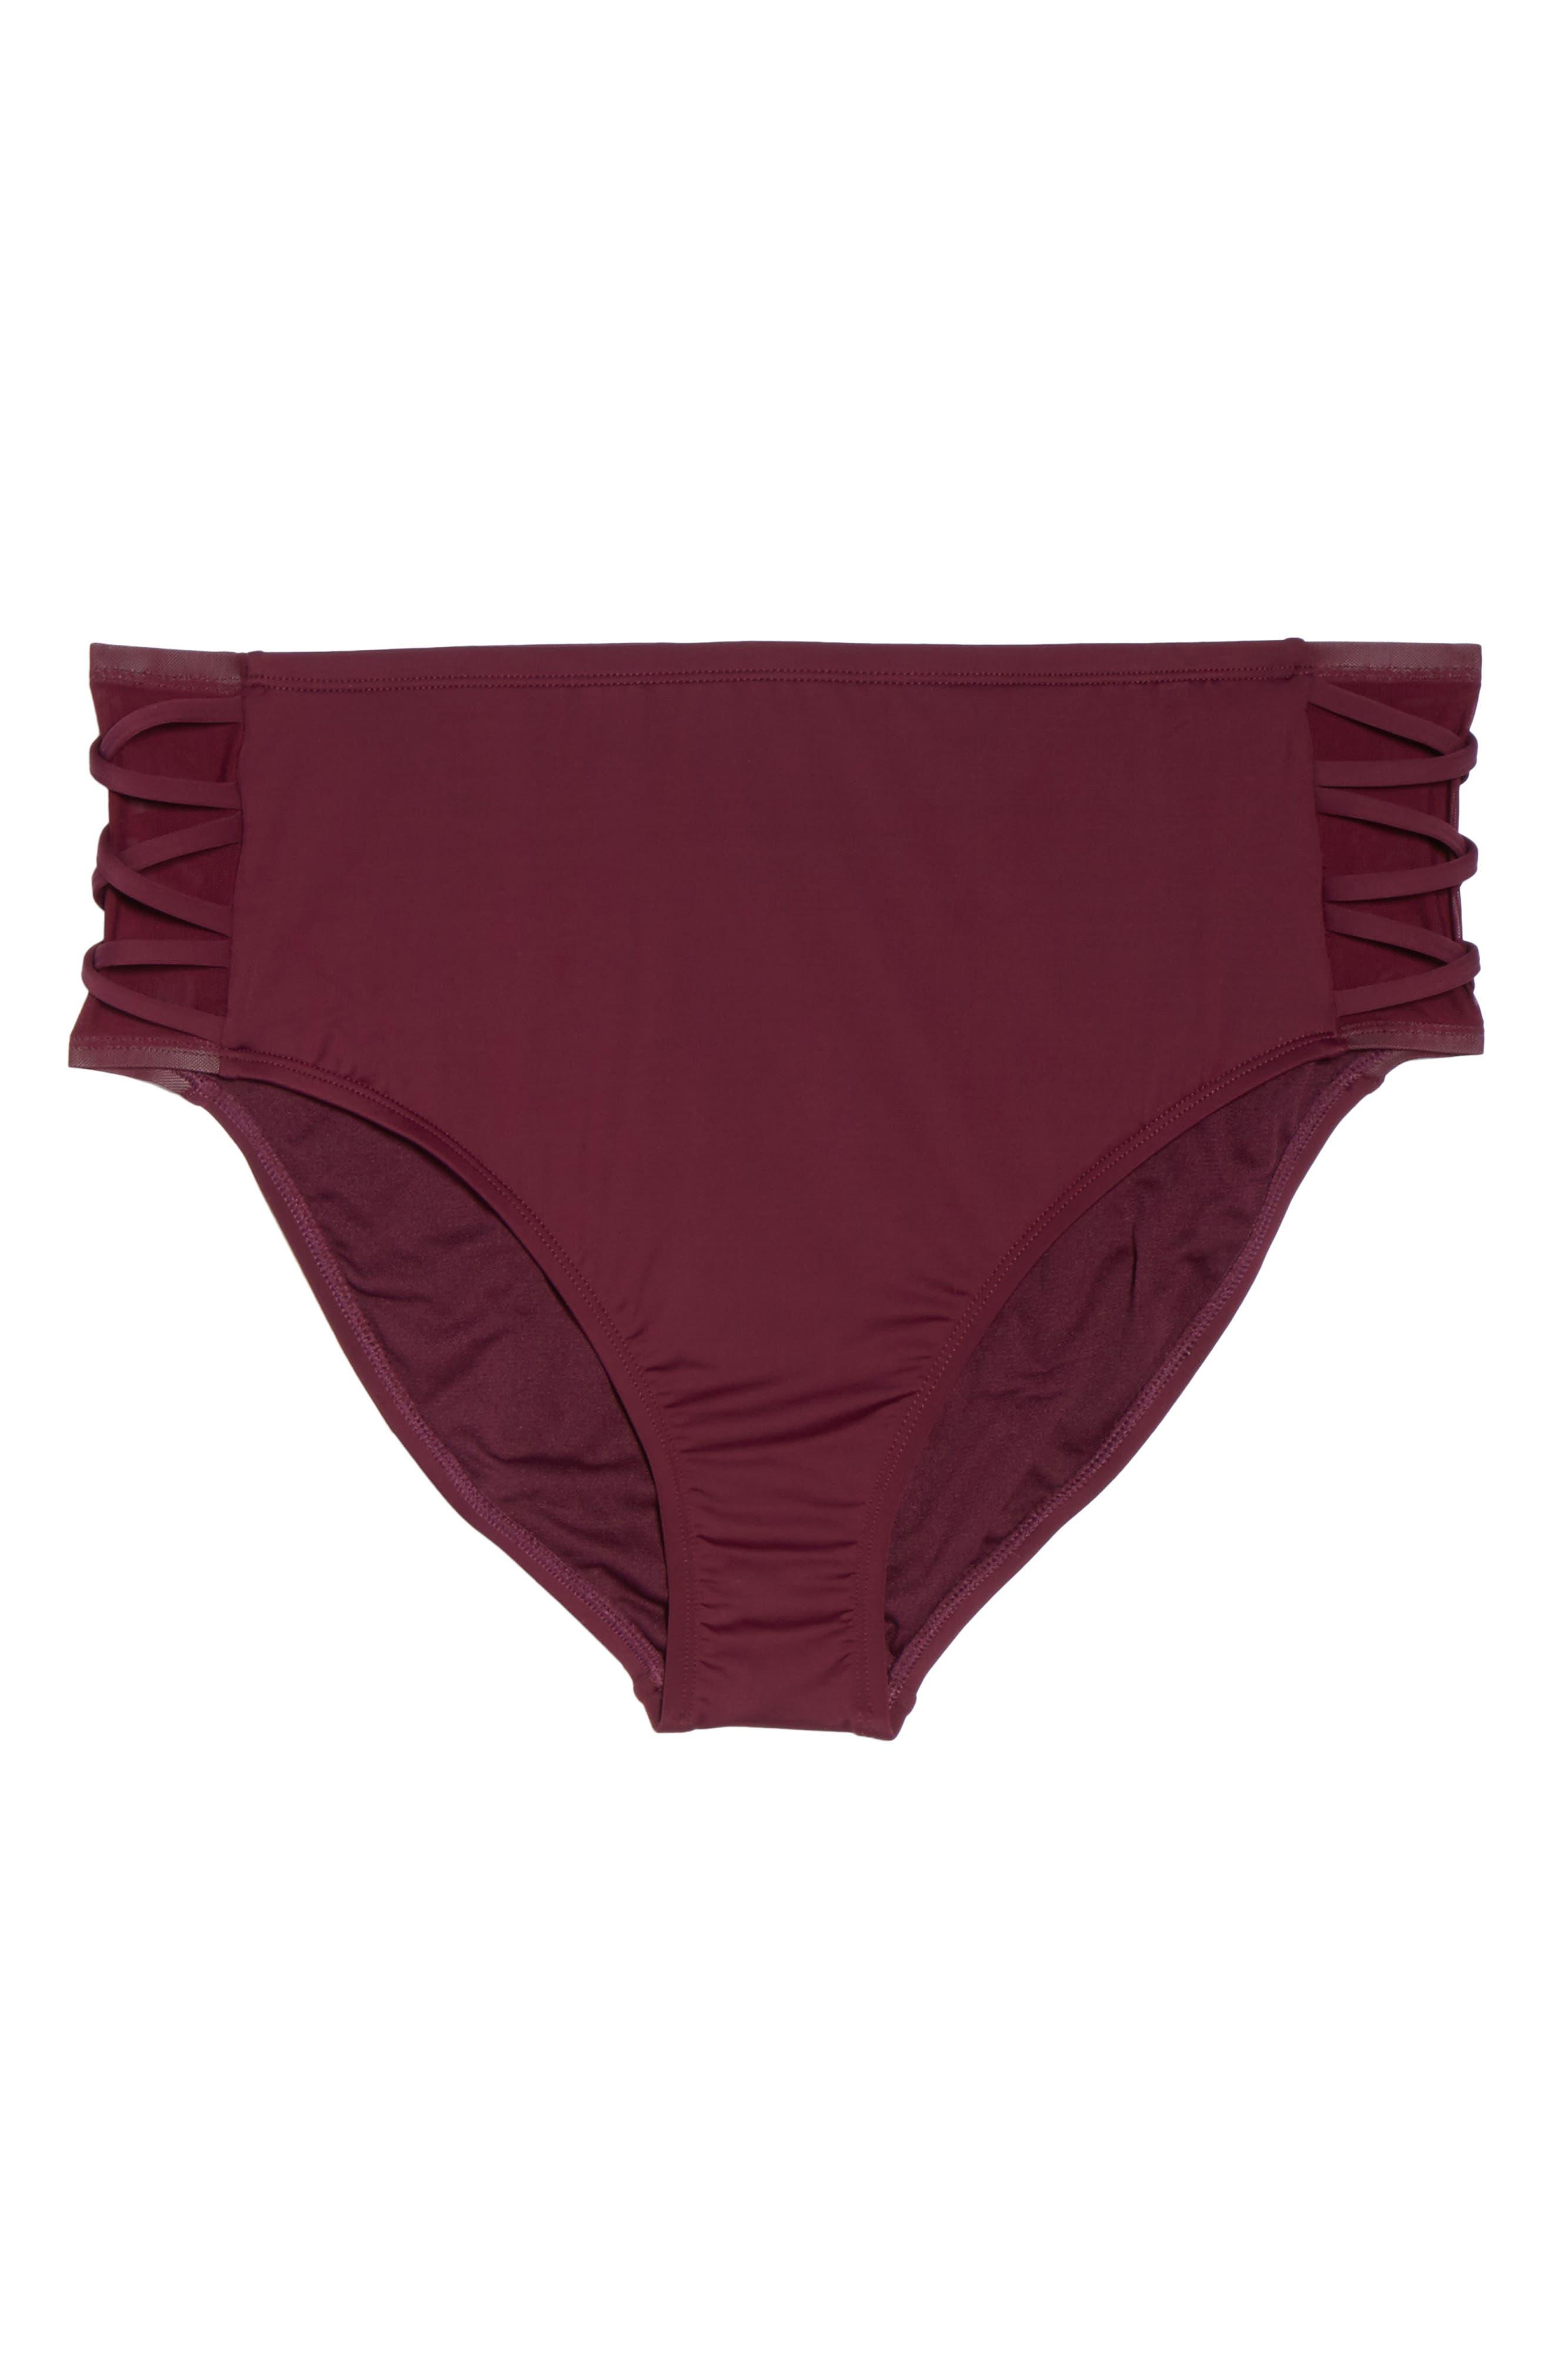 High Waist Bikini Bottoms,                             Alternate thumbnail 6, color,                             Burgundy